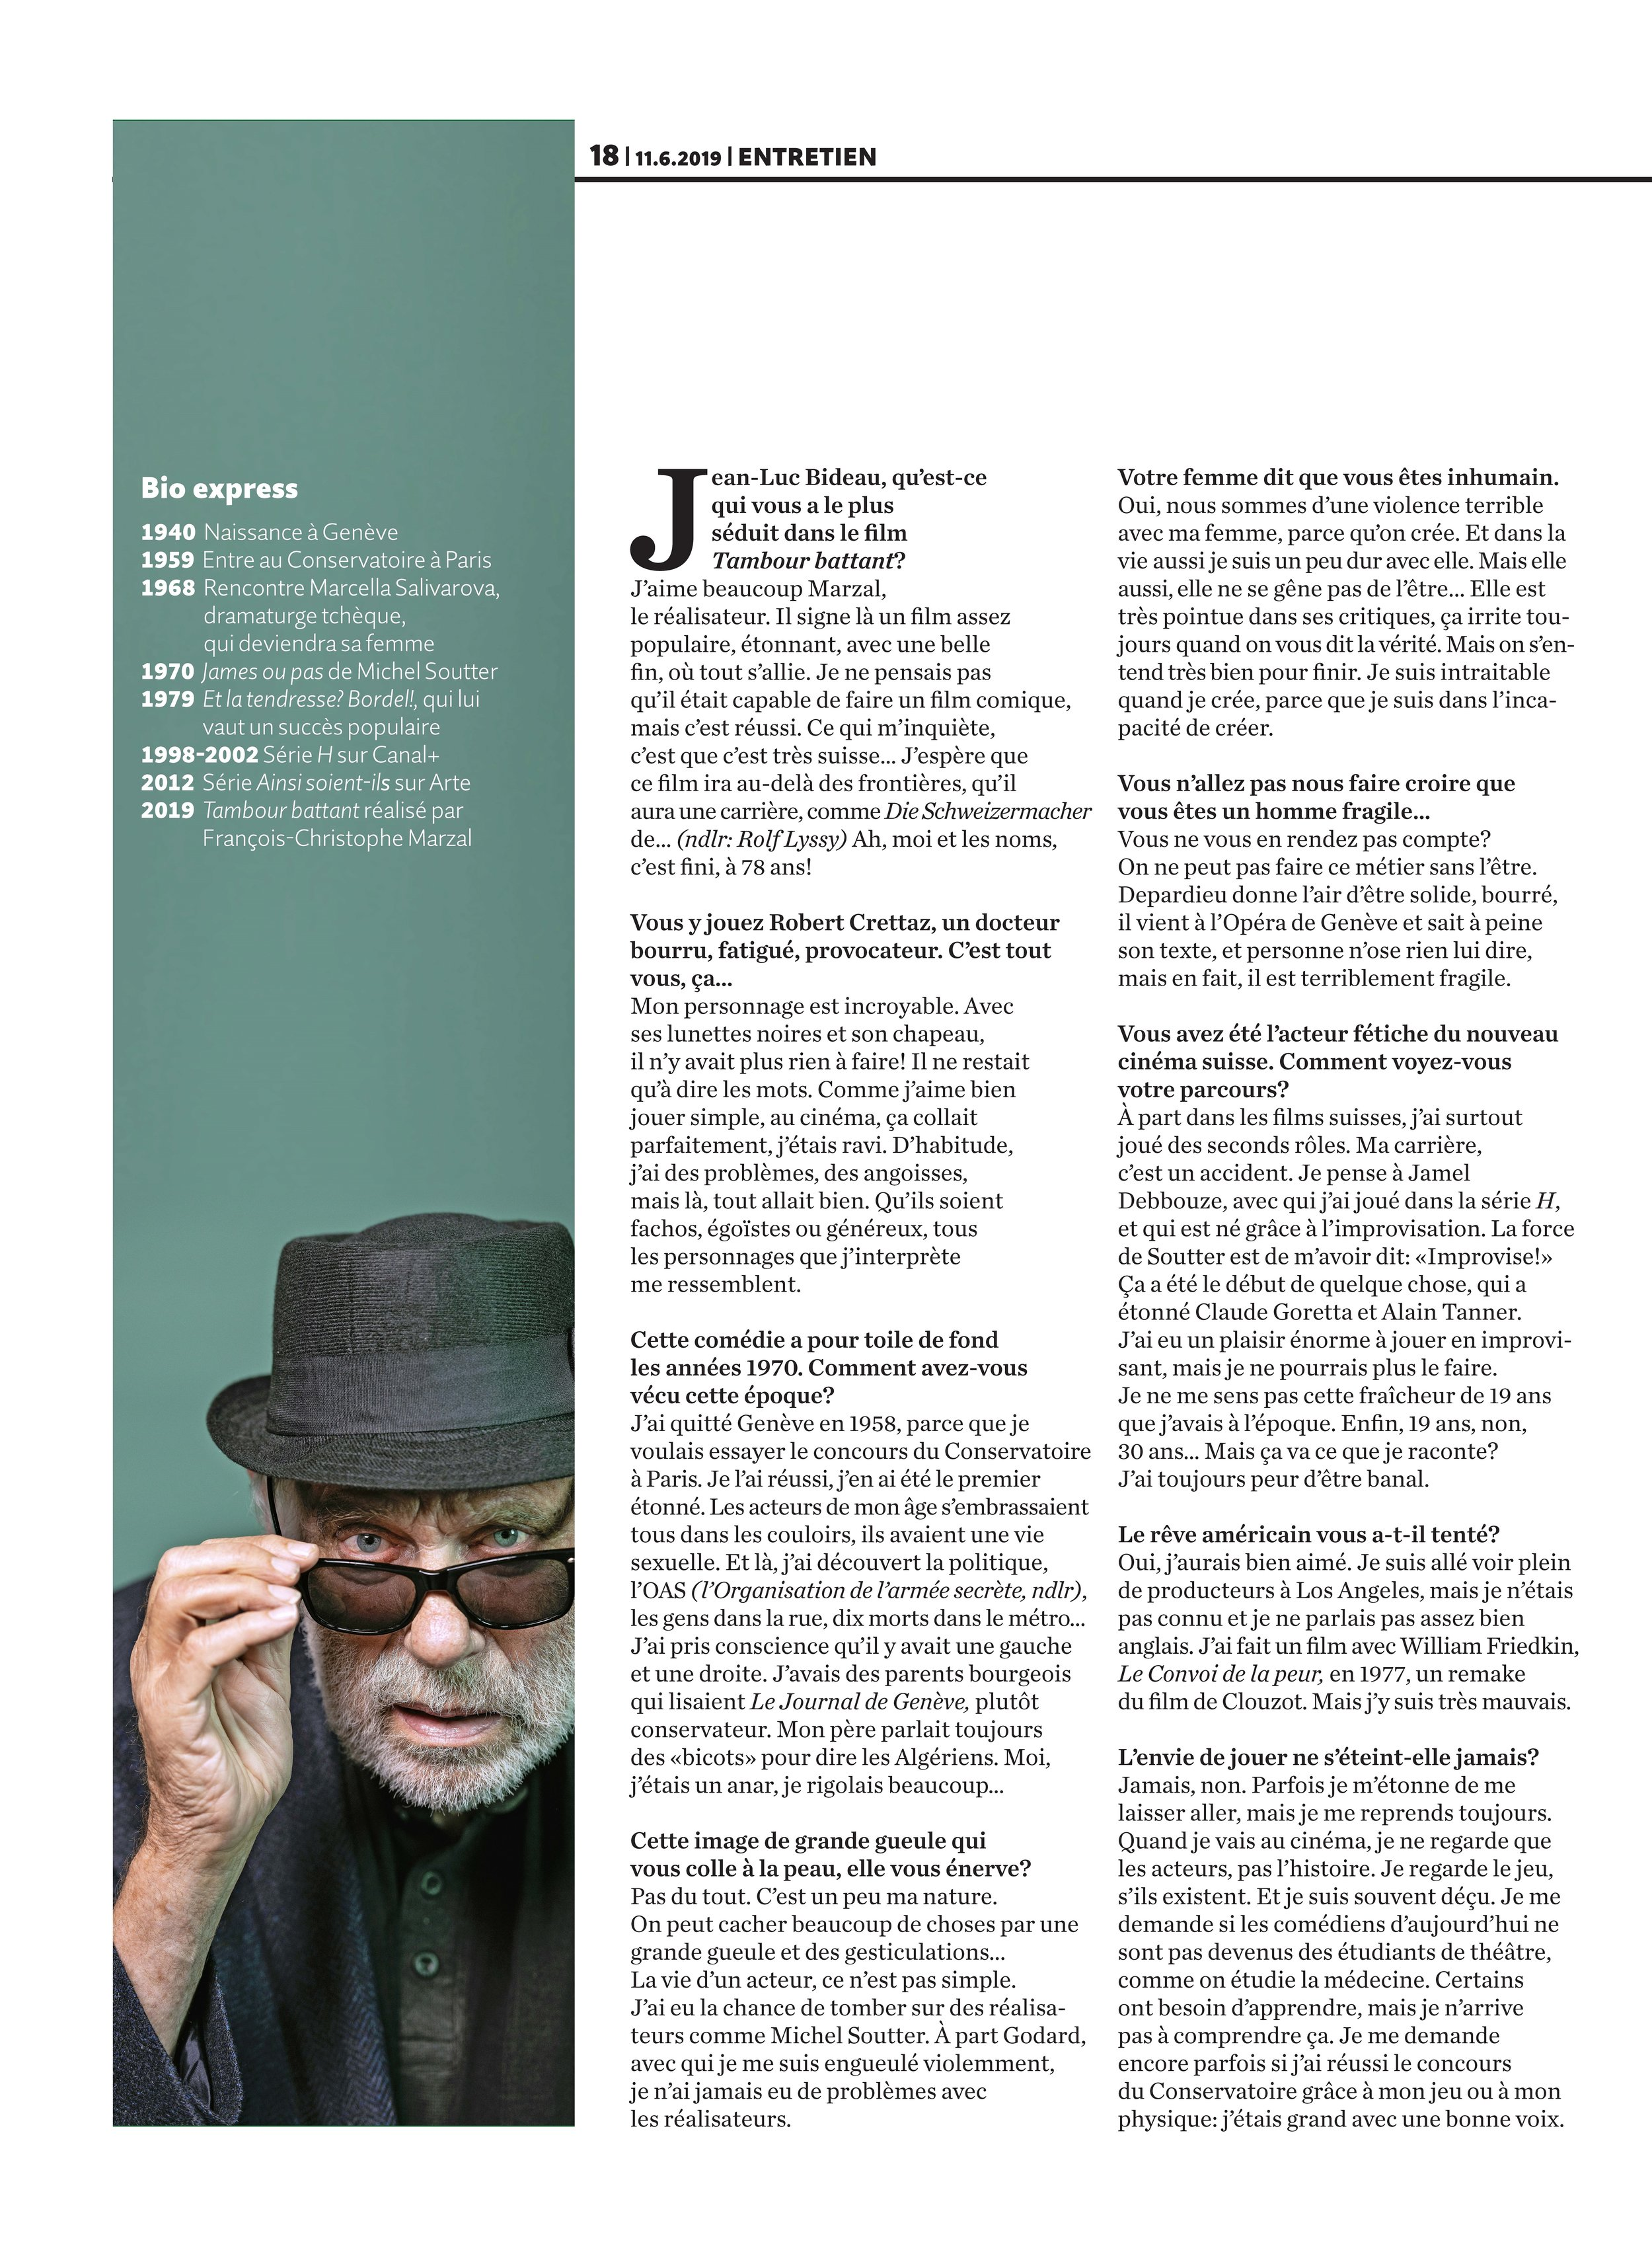 Migros Magazine - 6 Juin 2019 (page 3)